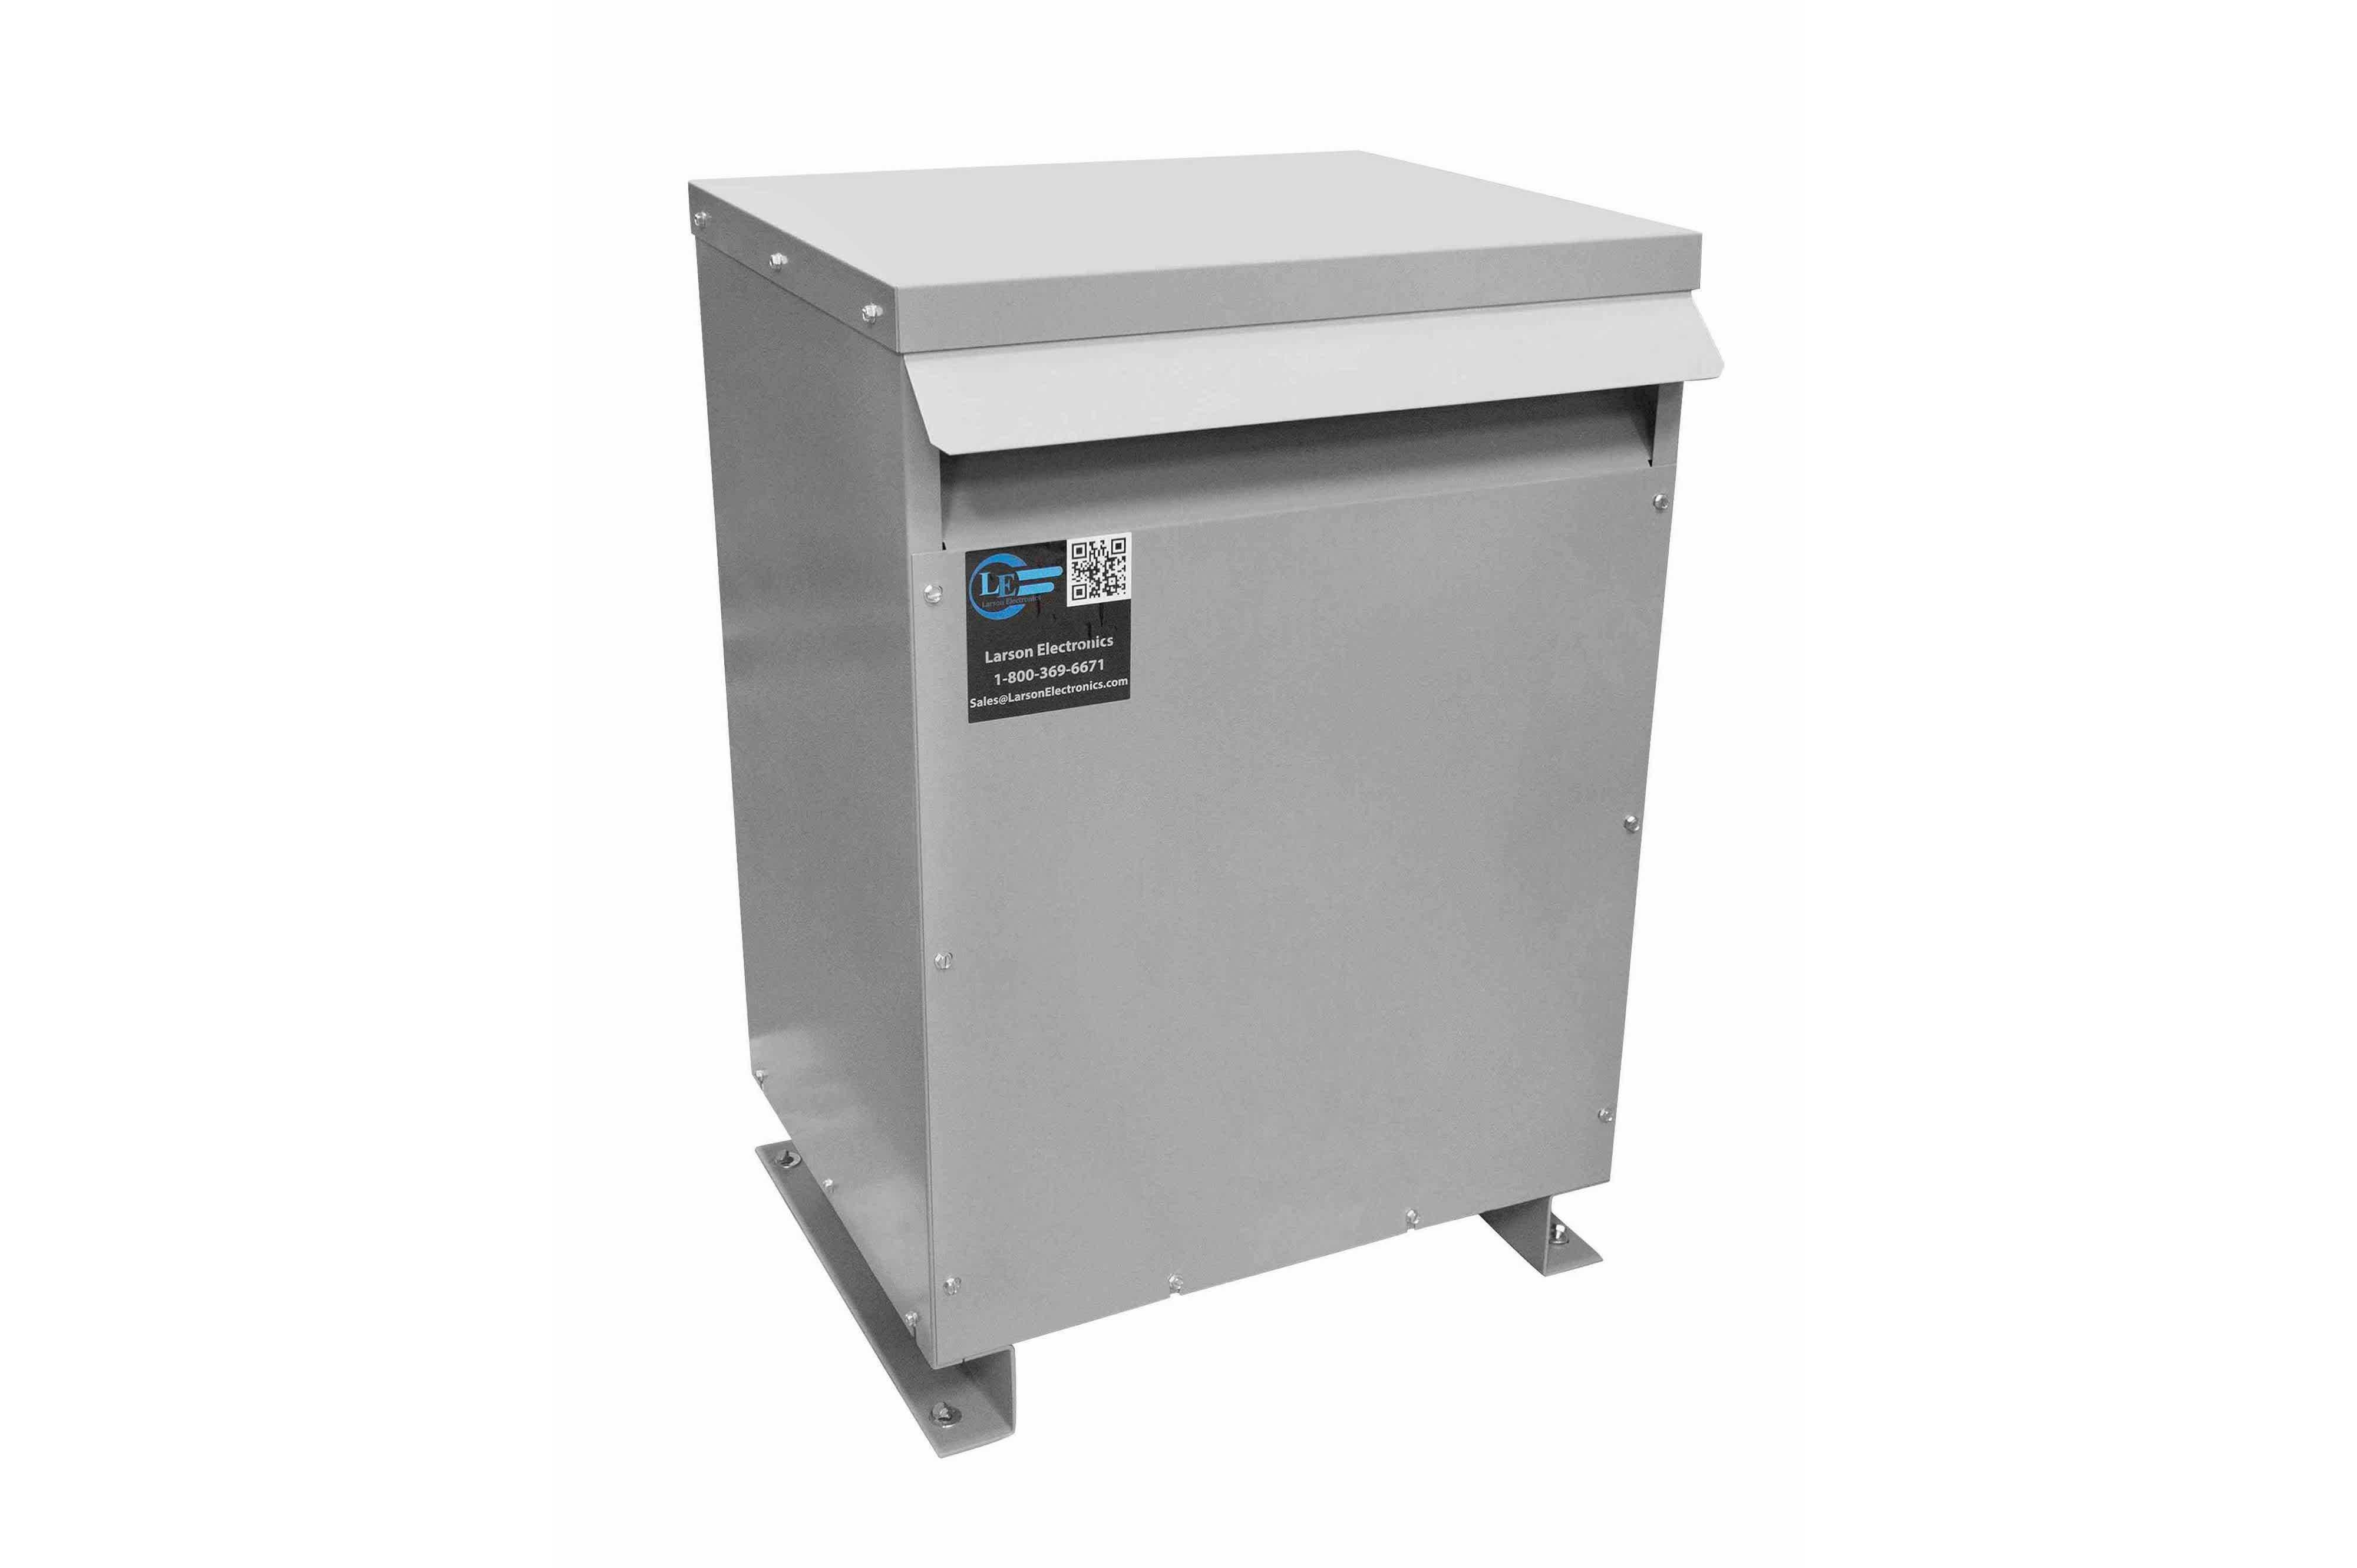 750 kVA 3PH Isolation Transformer, 600V Wye Primary, 380Y/220 Wye-N Secondary, N3R, Ventilated, 60 Hz